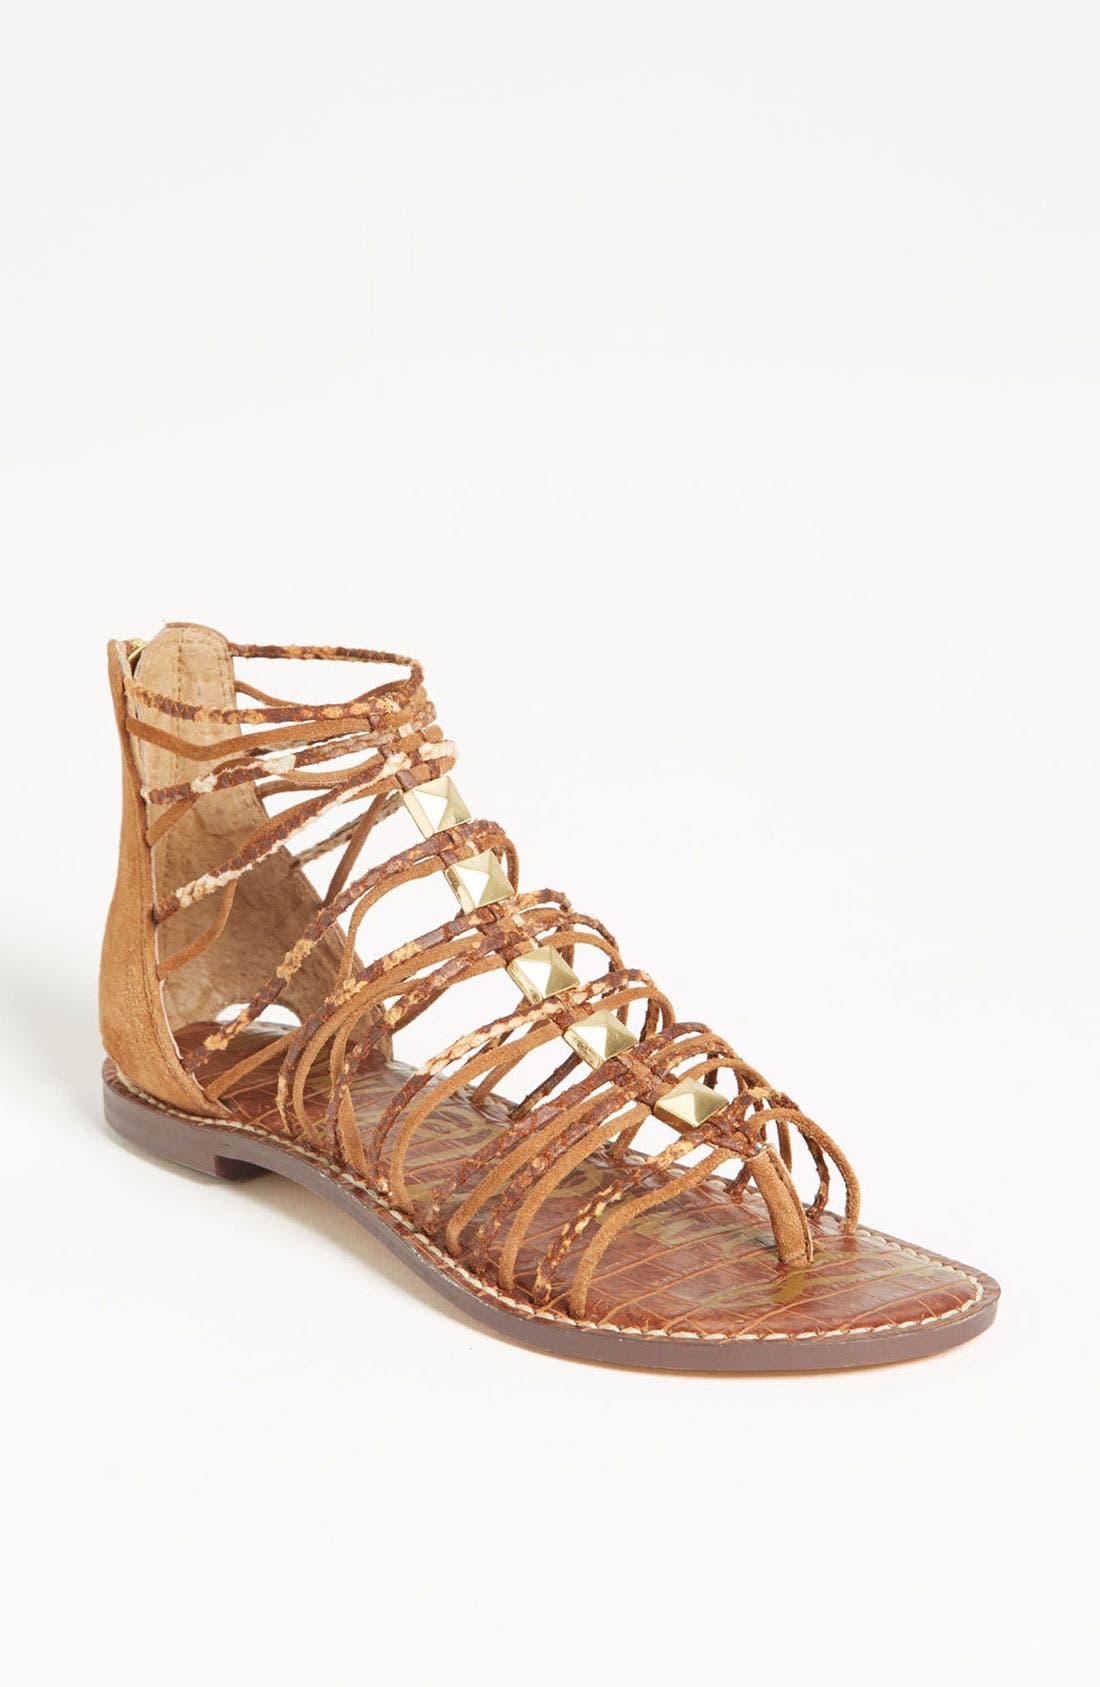 Main Image - Sam Edelman 'Grant' Sandal